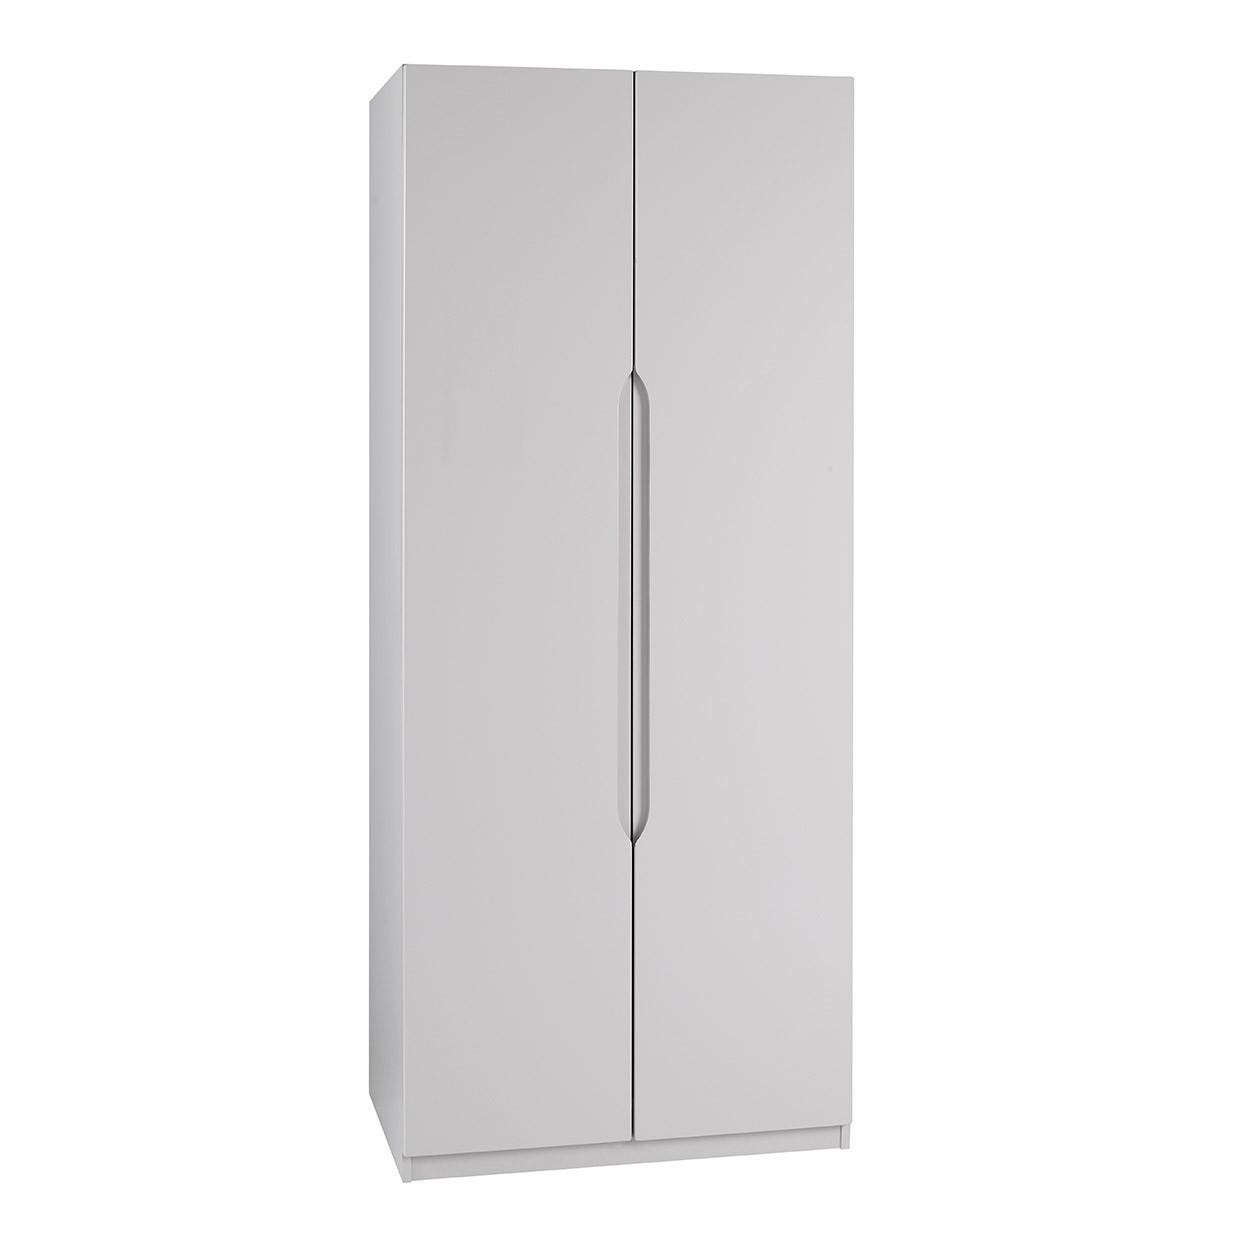 Cashmere Grey High Gloss 2 Door Wardrobe